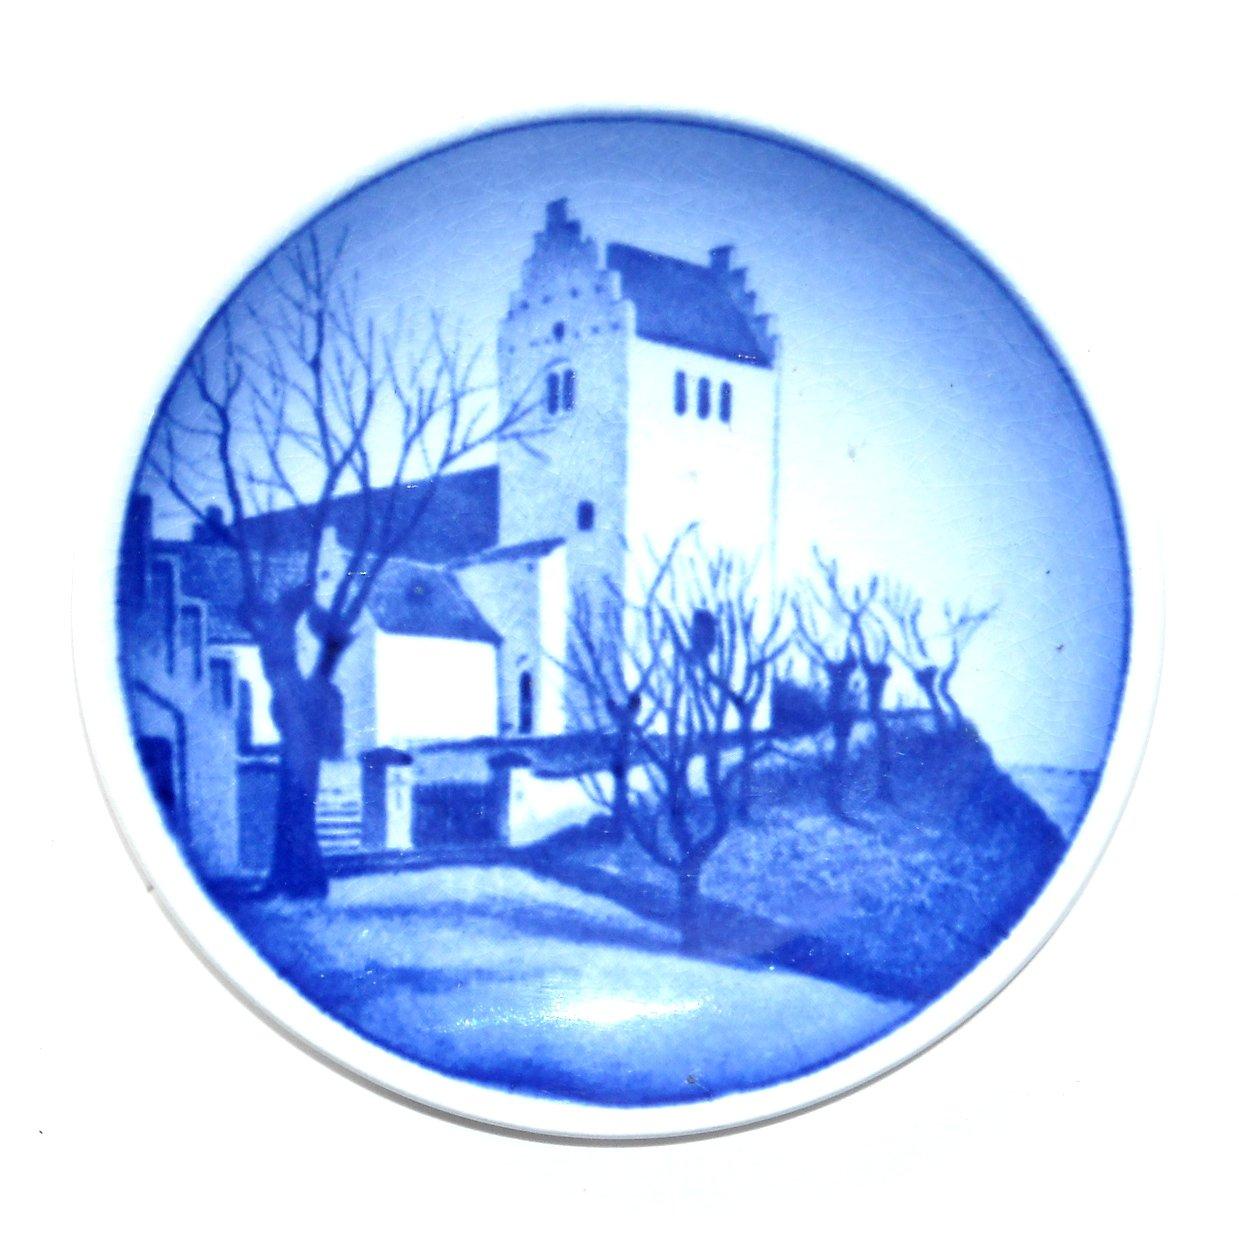 Faarevejle Kirke Denmark Aluminia Royal Copenhagen Vintage Mini Plate